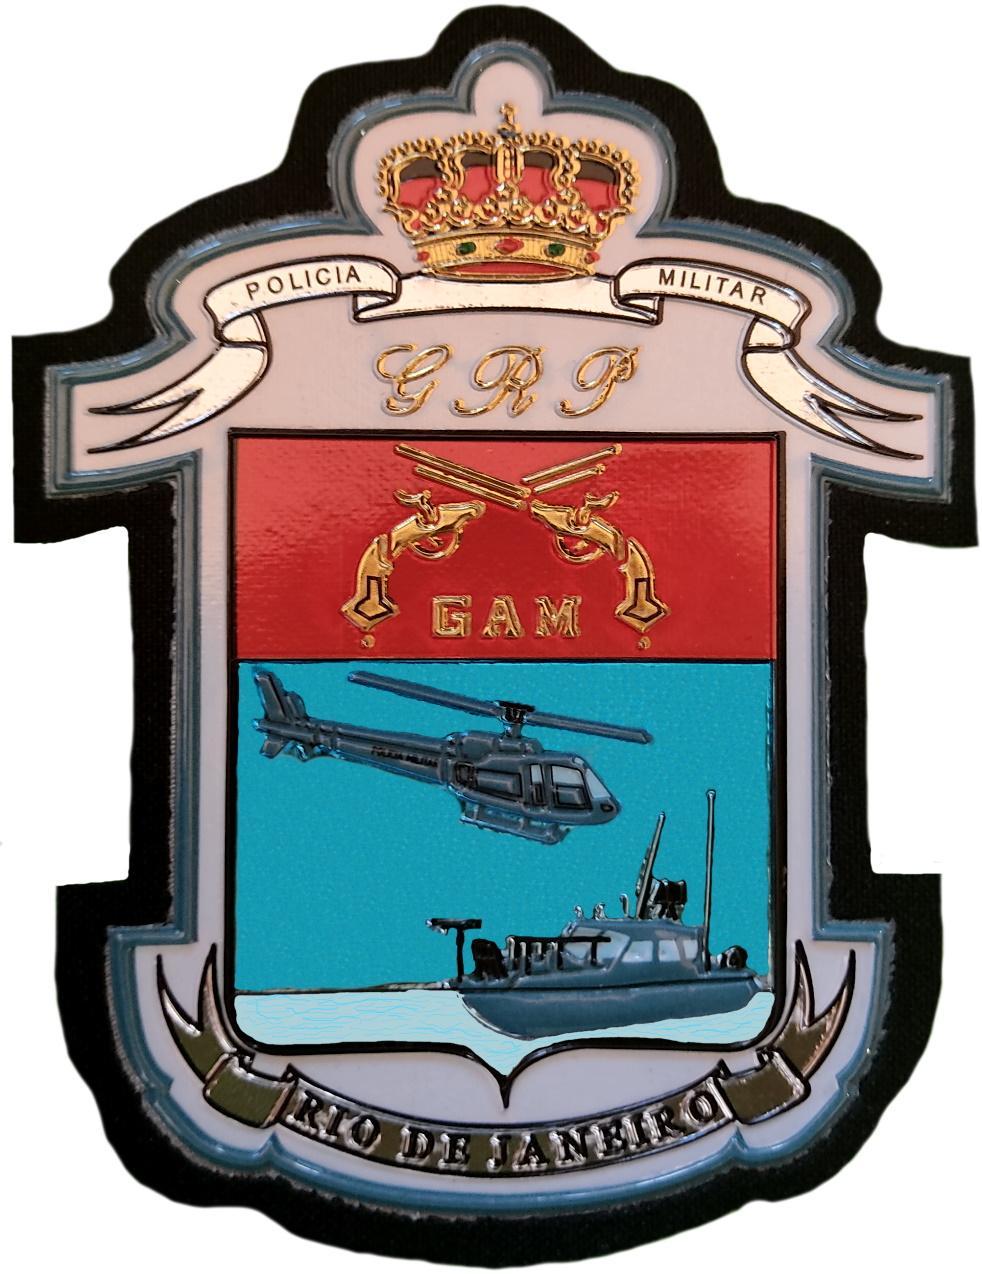 Policía Militar de Rio de Janeiro GAM Grupo Aéreo Móvil Grupamento aero movel parche insignia emblema distintivo